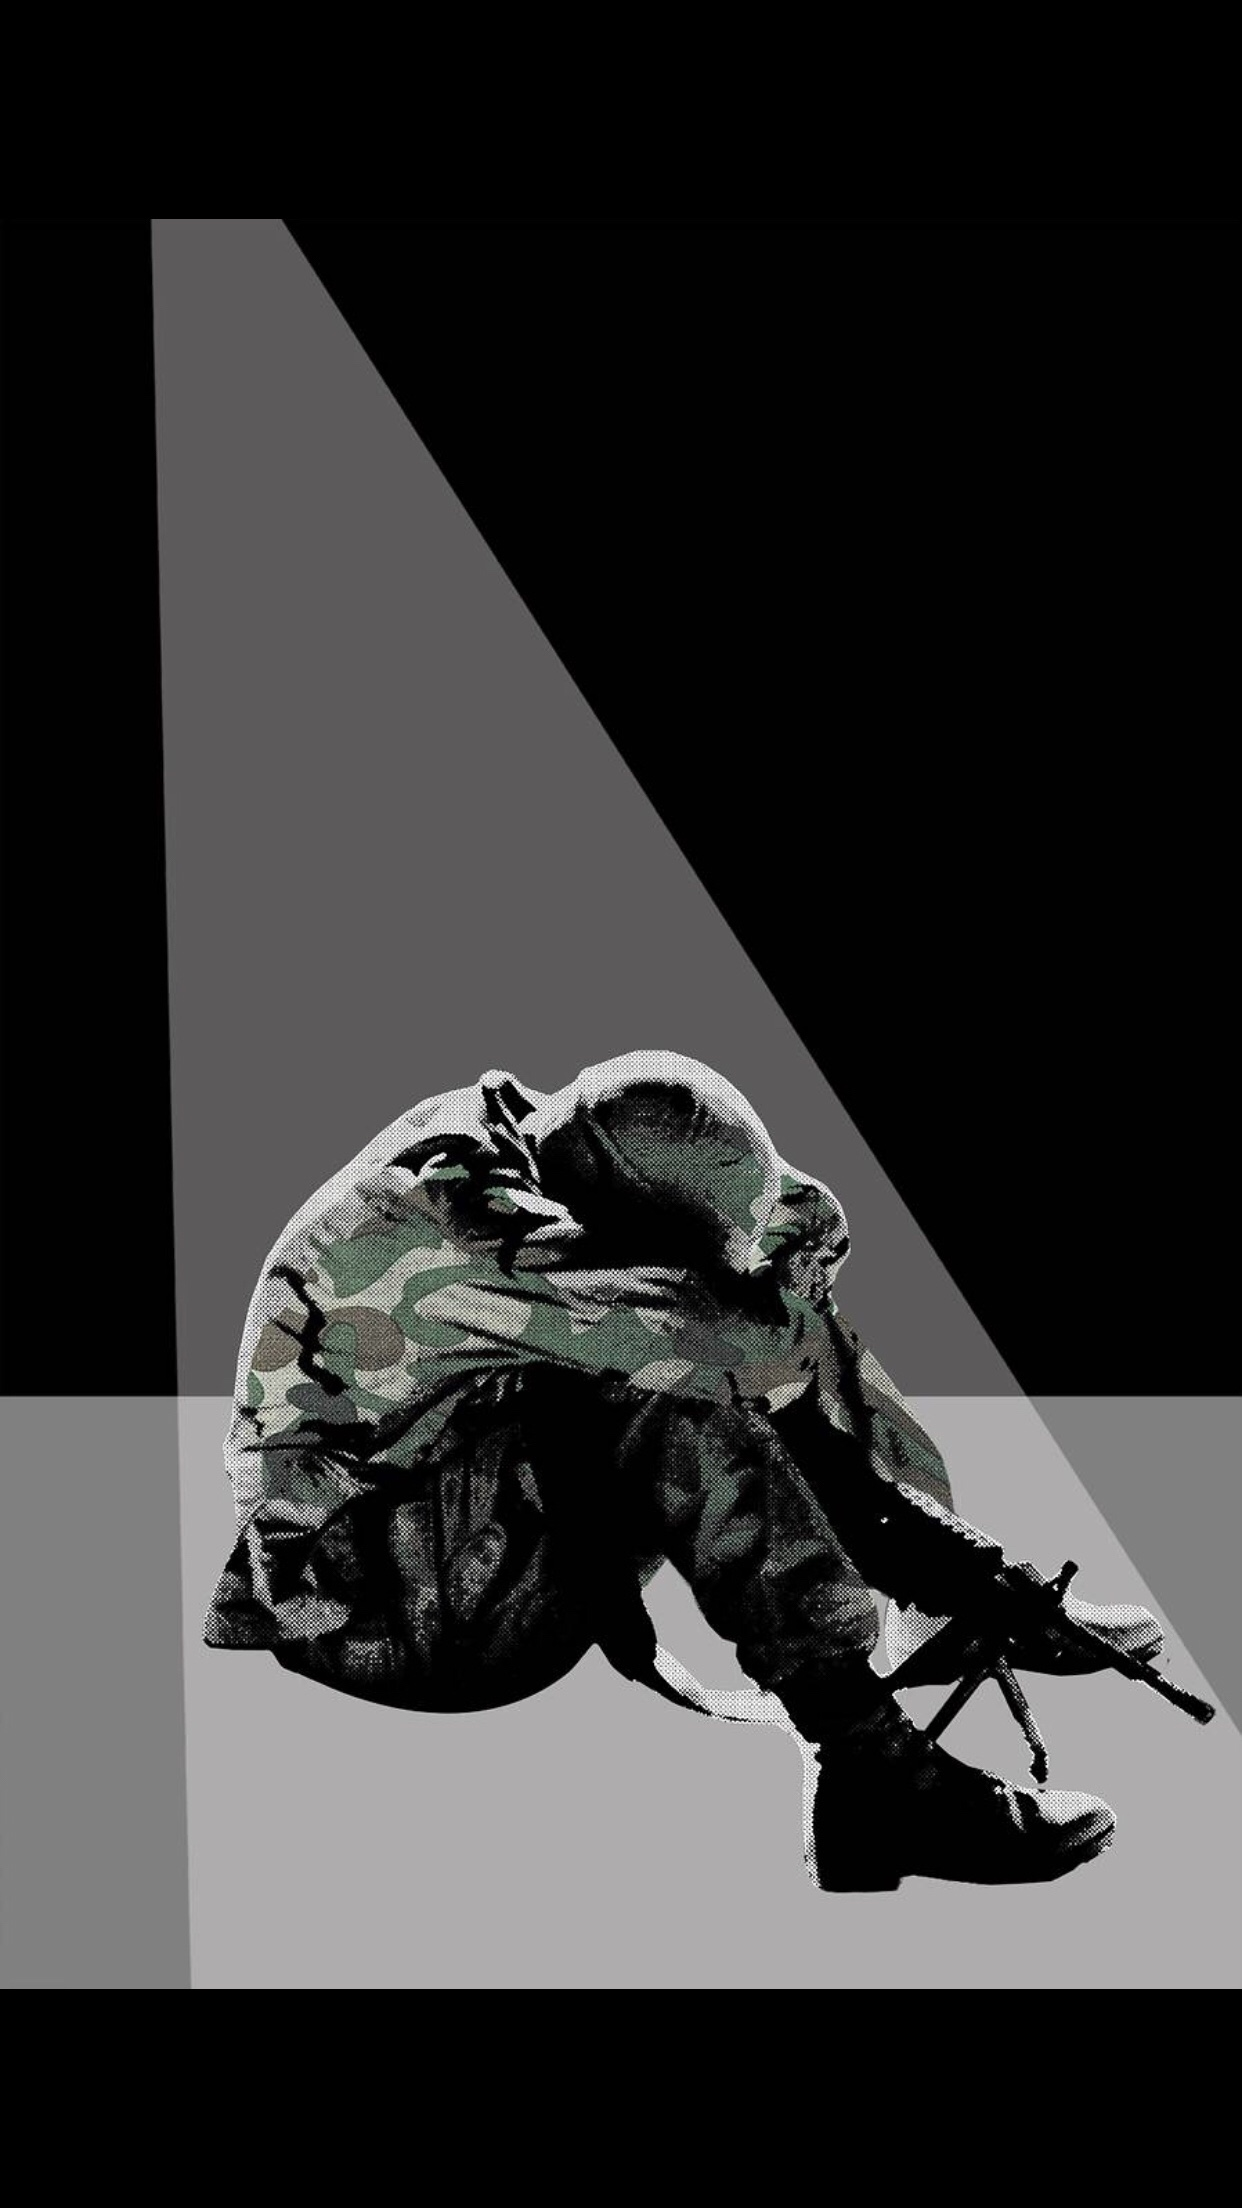 Hookup a combat veteran with ptsd